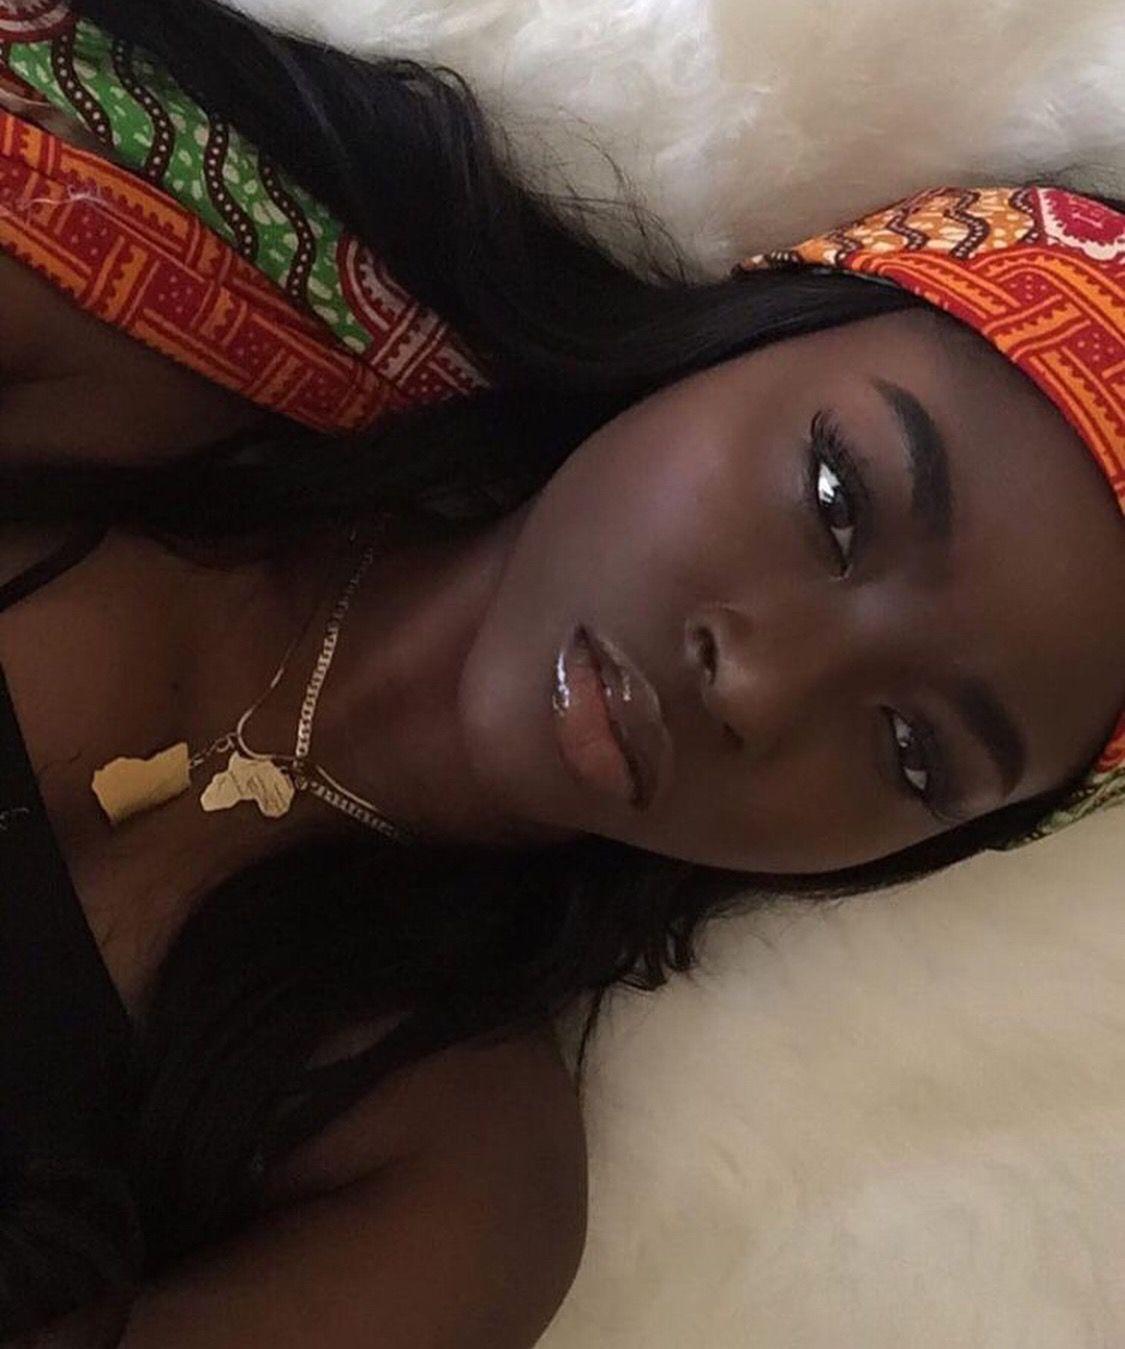 Nose piercing black girl  Pinterest Danica  c o c O a C o l A  Pinterest  Black girls